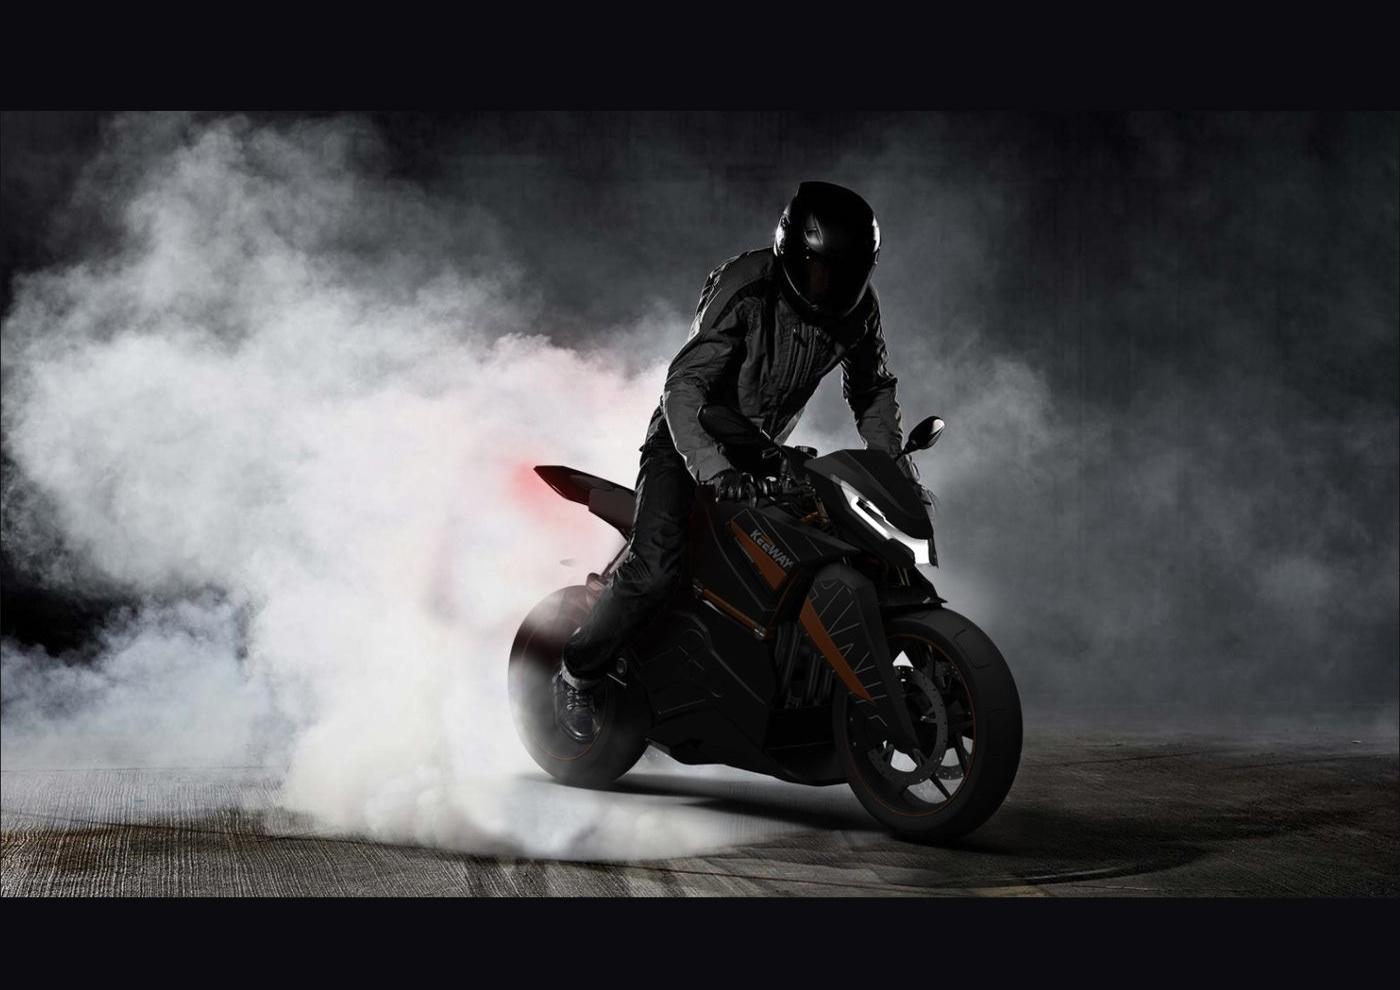 automotive   conceptbike motorcycle design engine benelli hybrid Bike industrialdesign motorbike